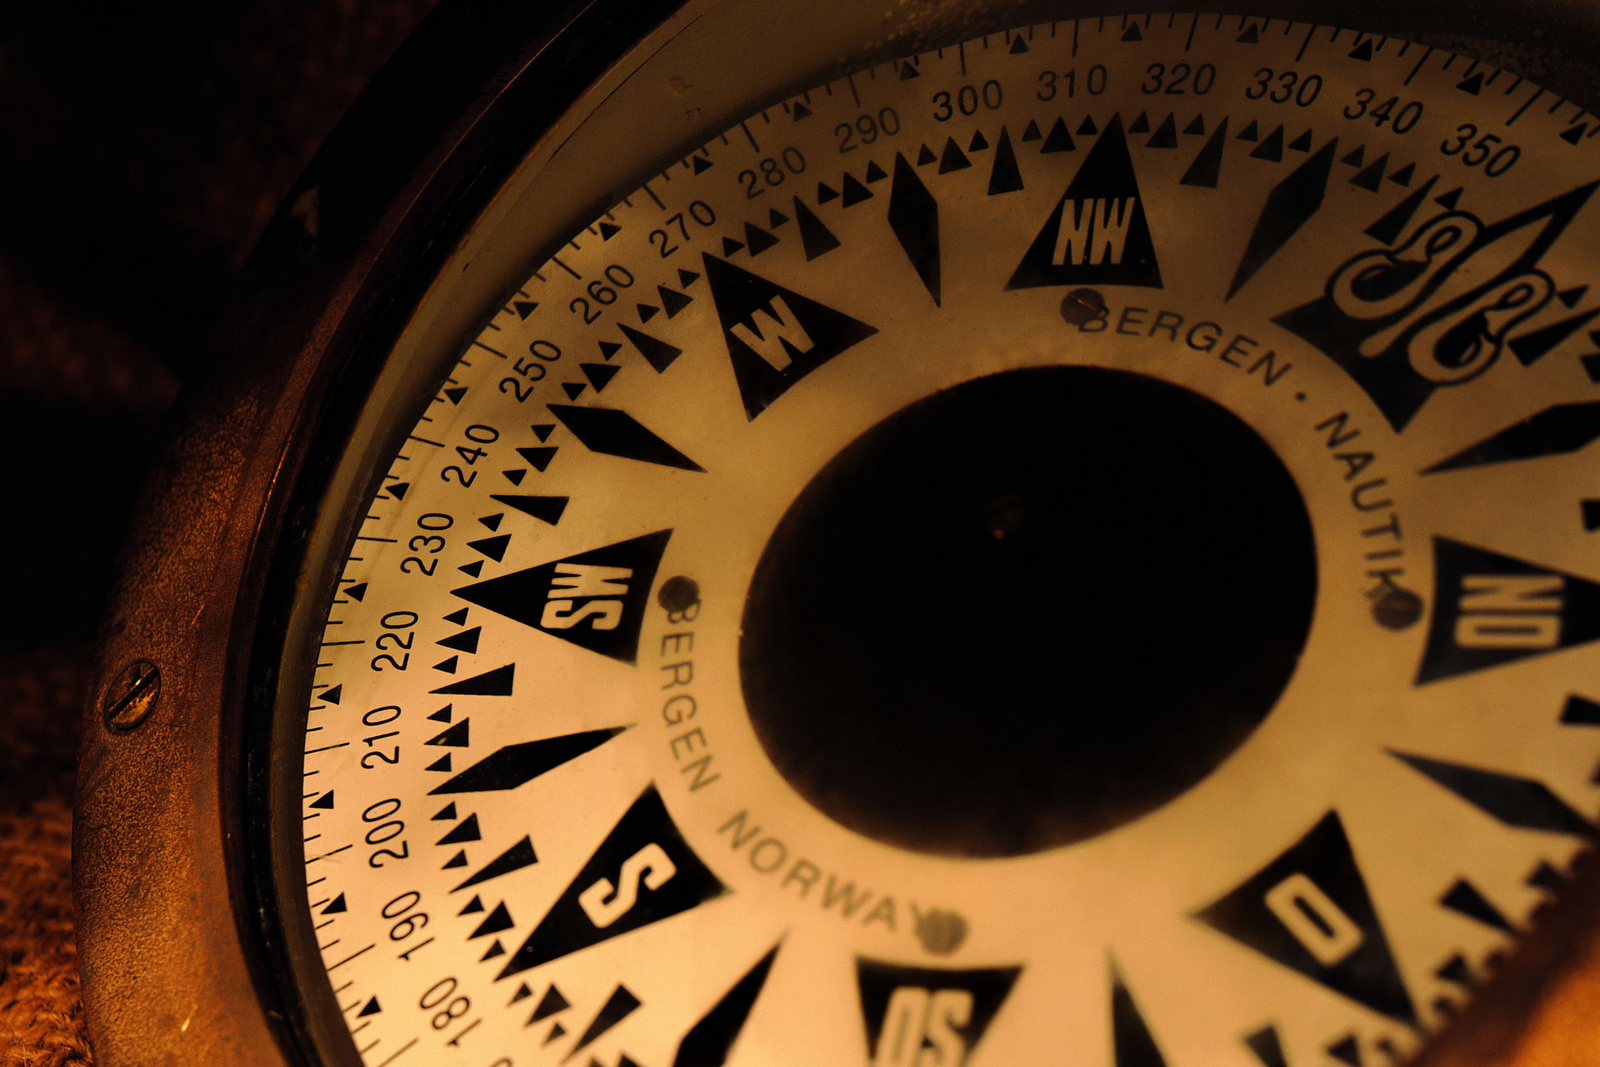 Compass sfondo and sfondi 1600x1067 id 668221 wallpaper abyss - Compass hd wallpaper ...